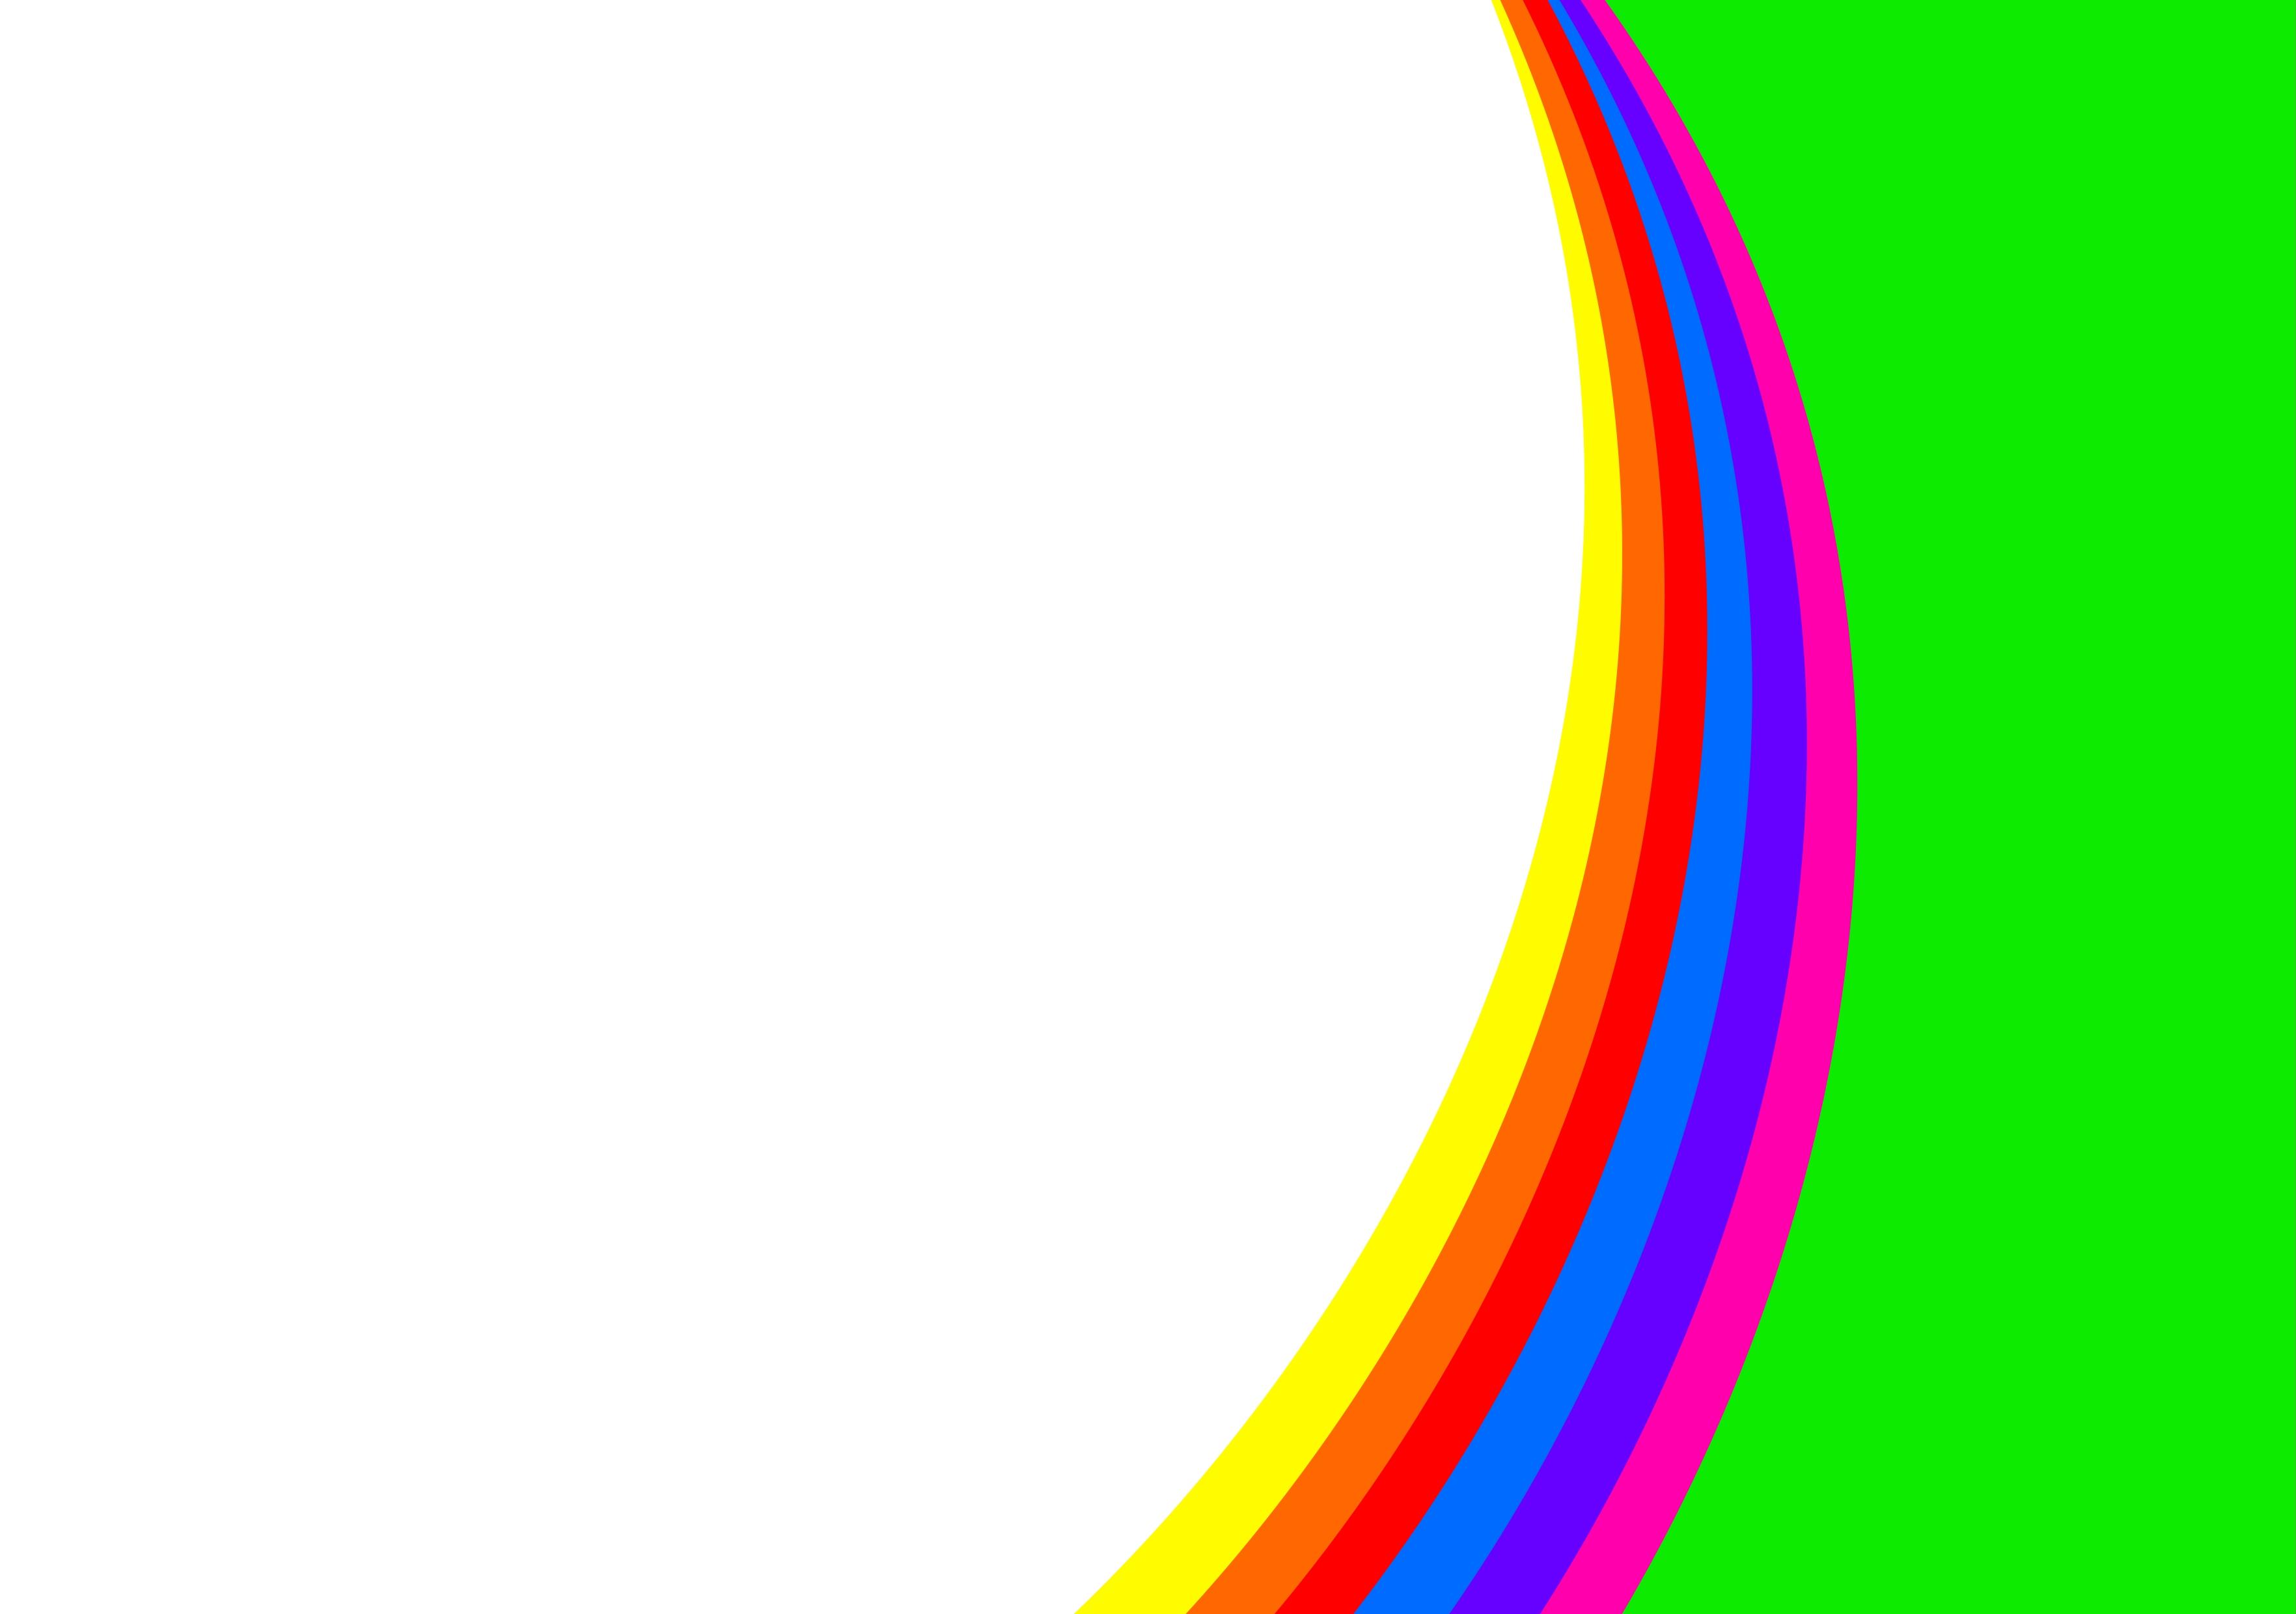 3527x2480 Rainbow Swirl Clip Art